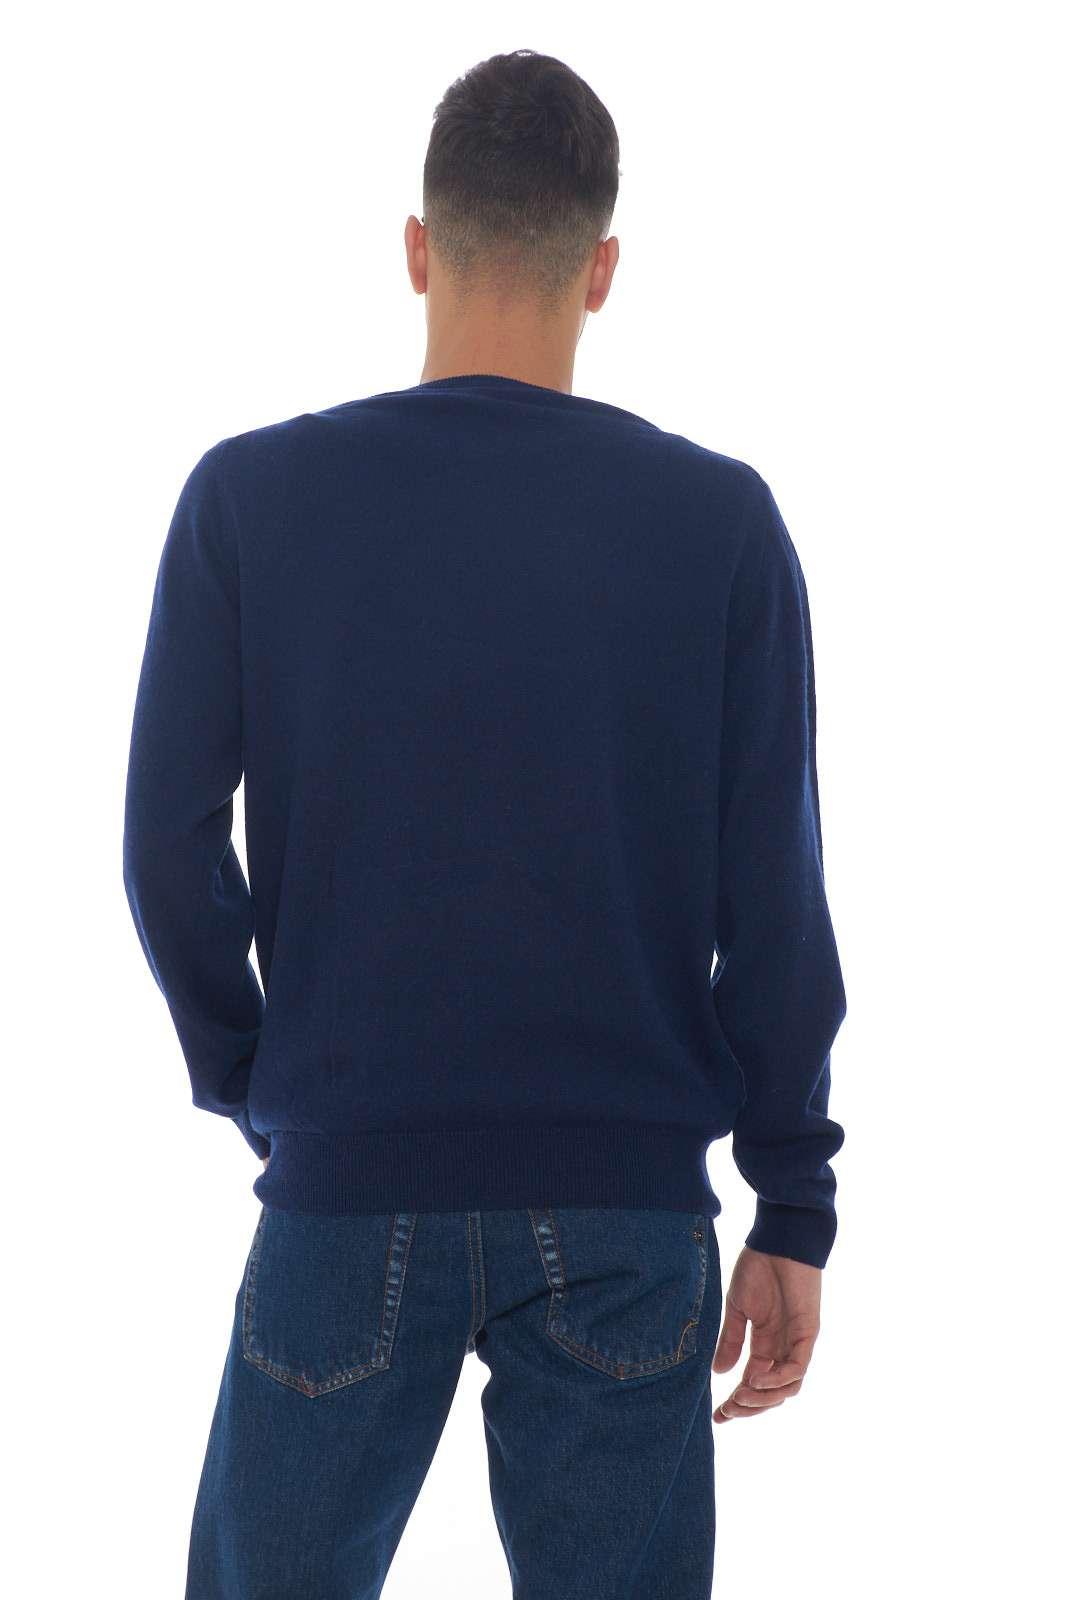 https://www.parmax.com/media/catalog/product/a/i/AI-outlet_parmax-maglia-uomo-Acquapura-006-C.jpg